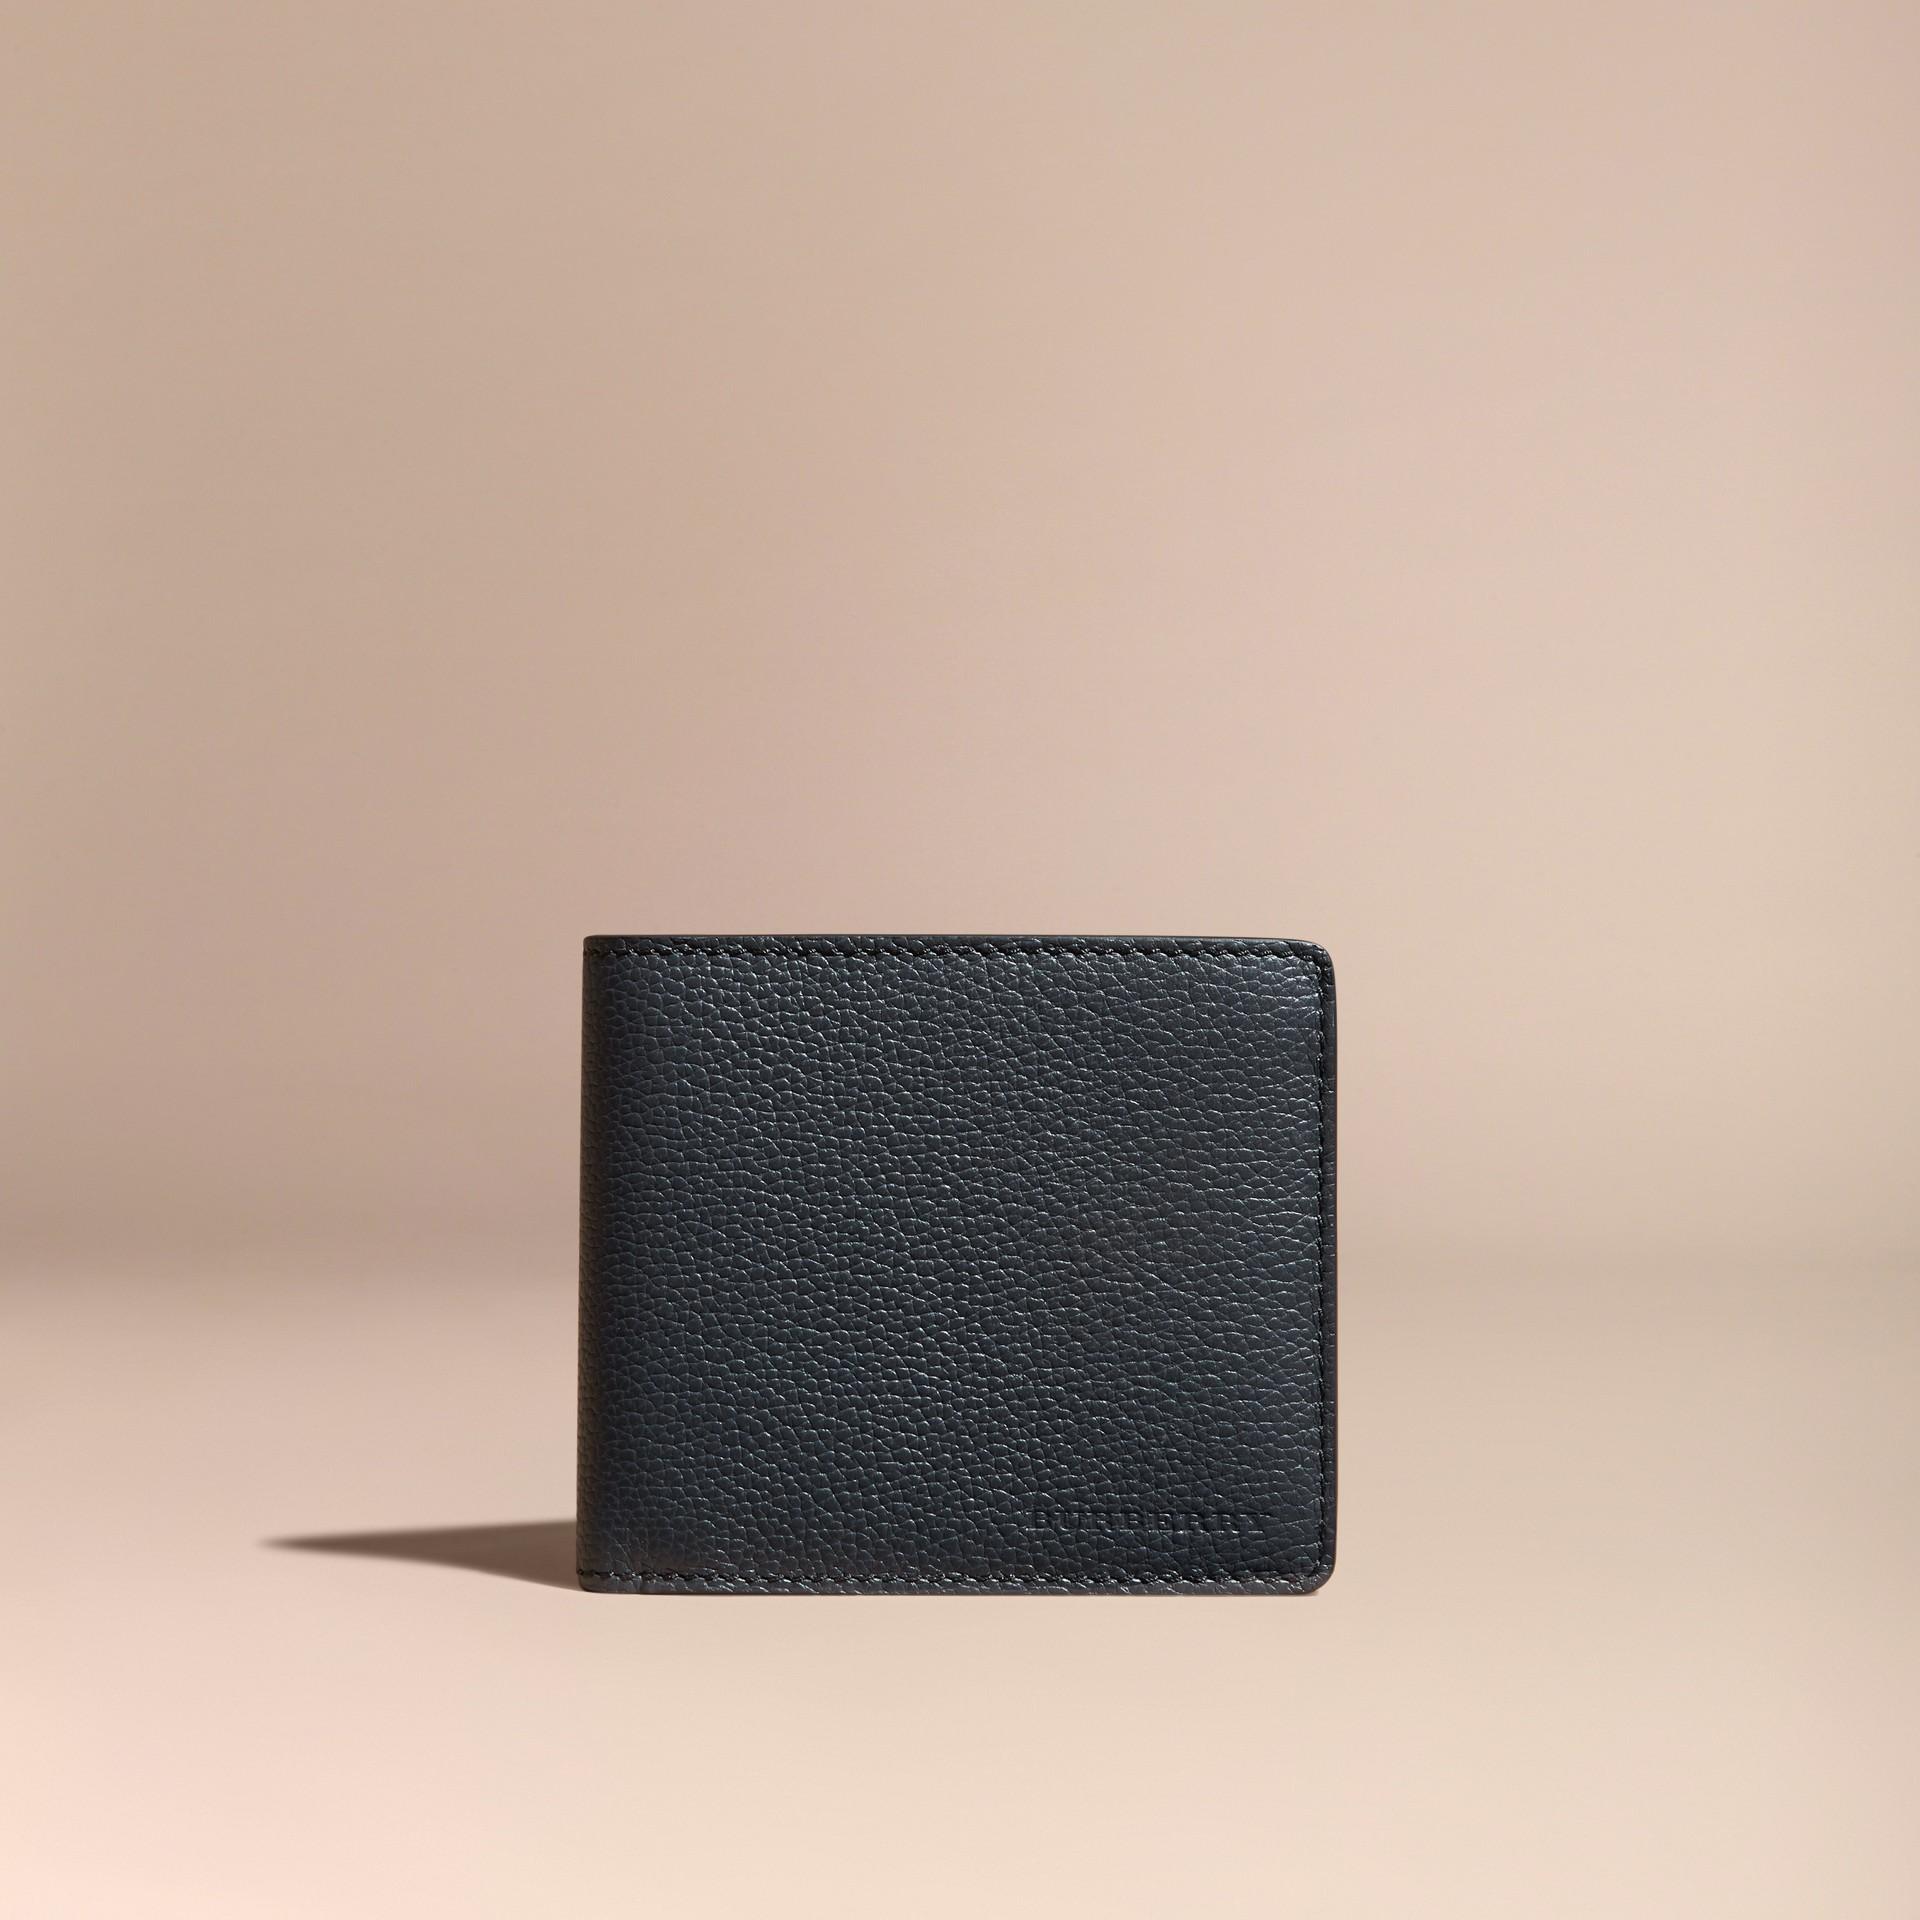 Dunkles zinnblau Faltbrieftasche aus Leder Dunkles Zinnblau - Galerie-Bild 6